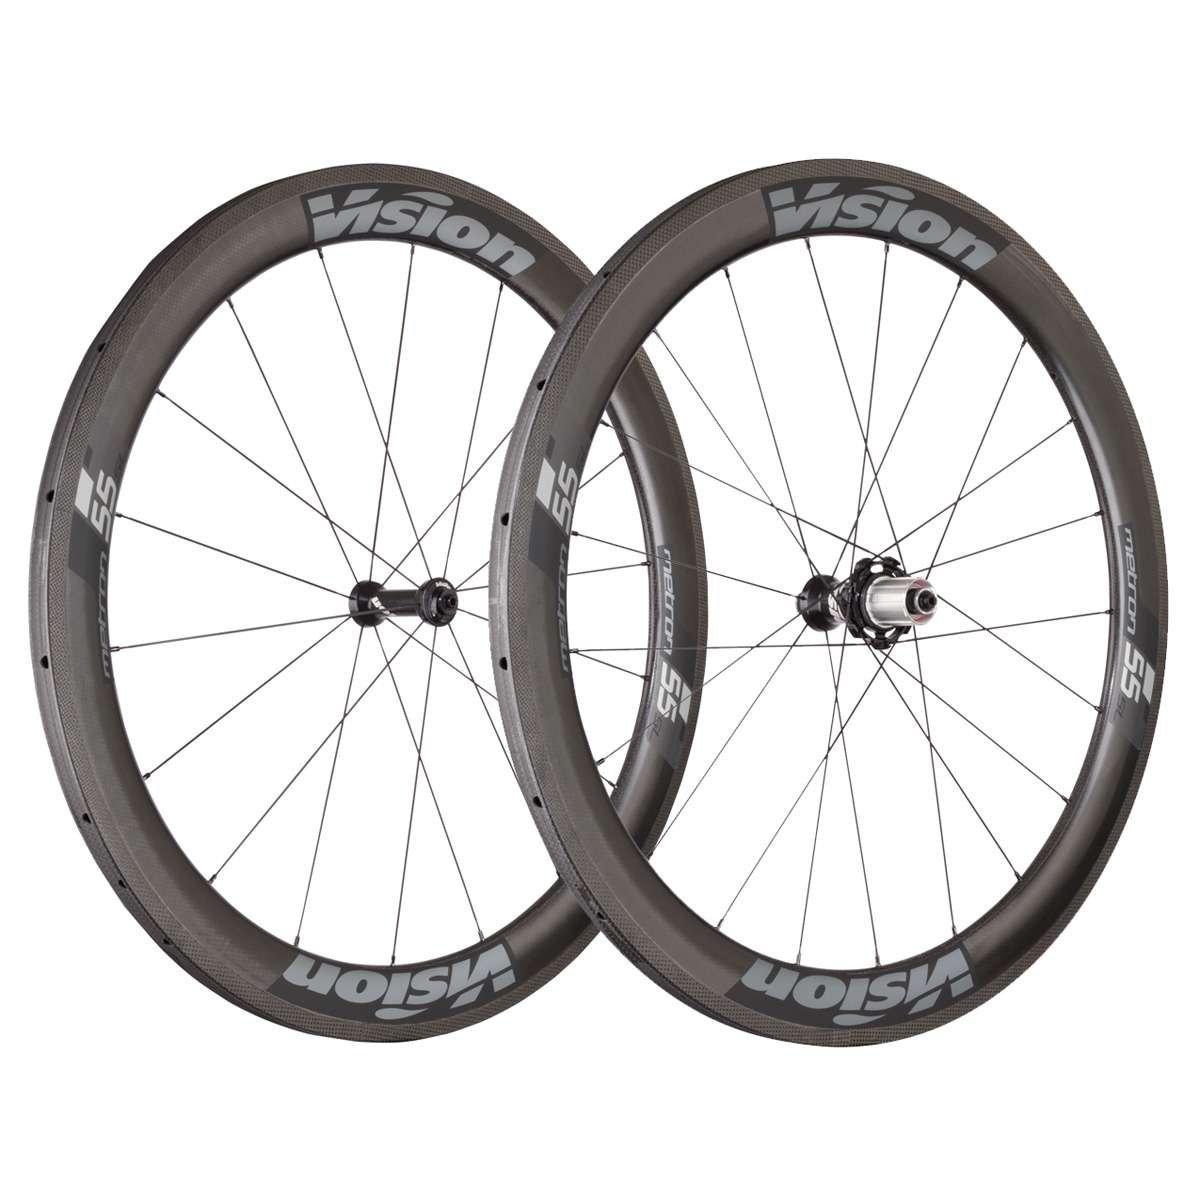 FSA Vision Metron 55 SL Tubular Bicycle Wheel Set - 710-0007191030